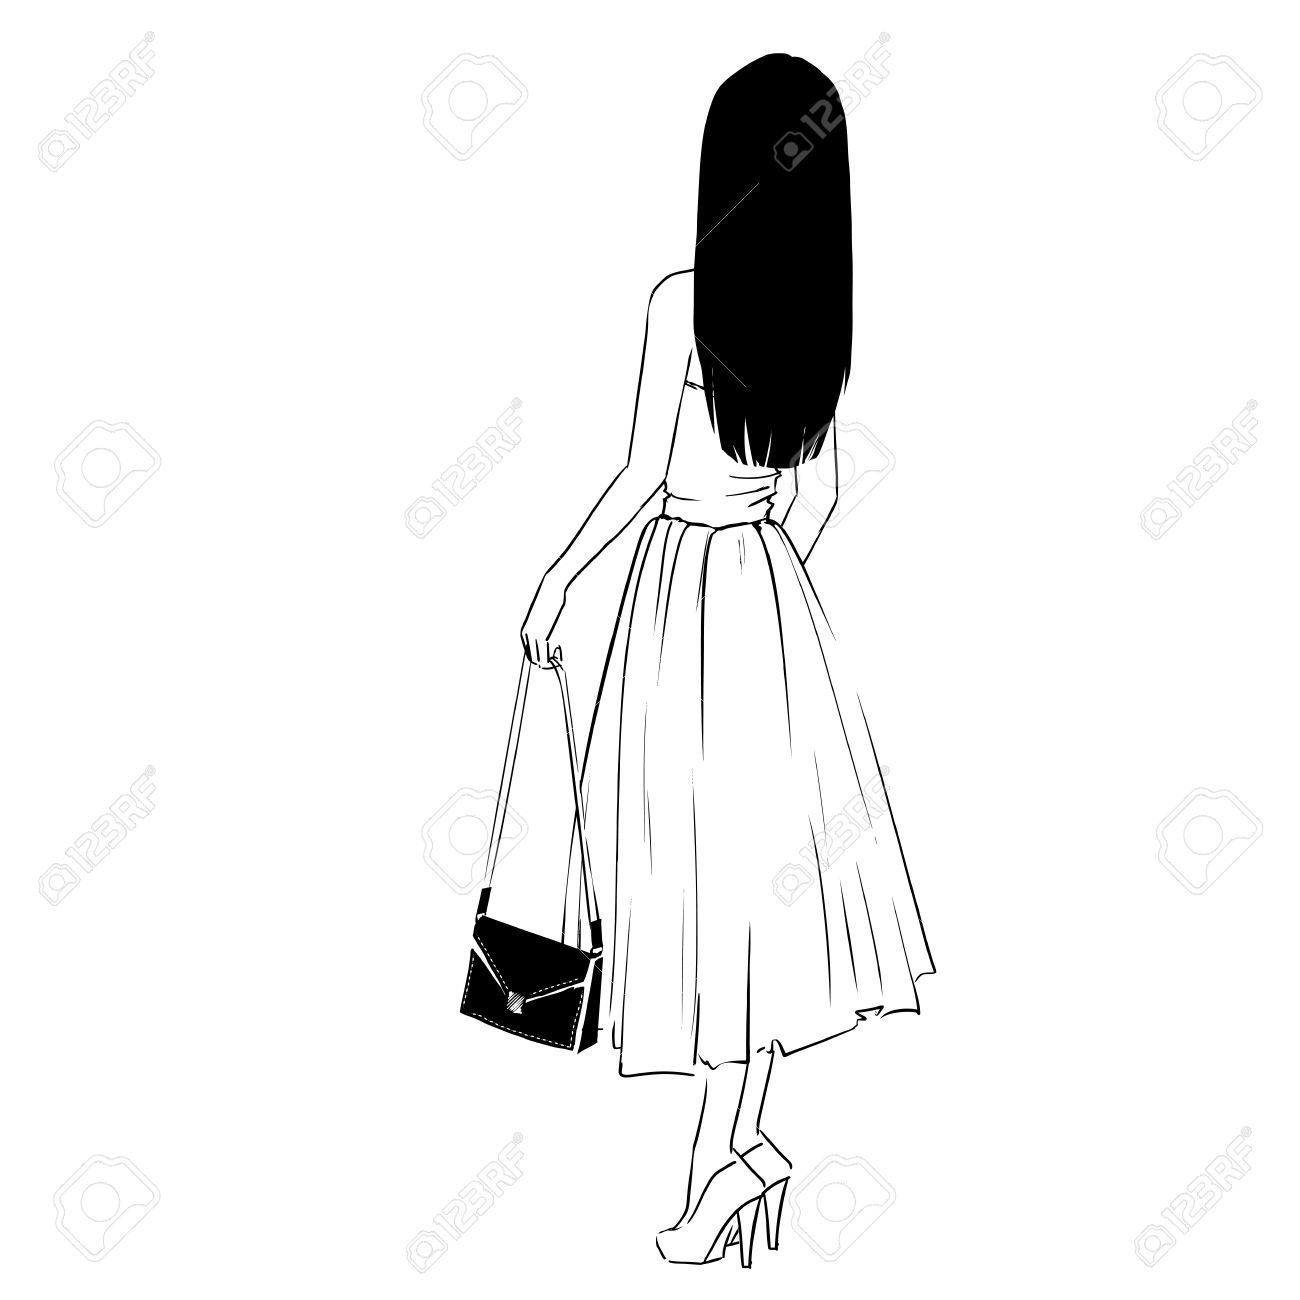 Femme Elegante En Robe De Soiree Avec Un Embrayage Debout Dos